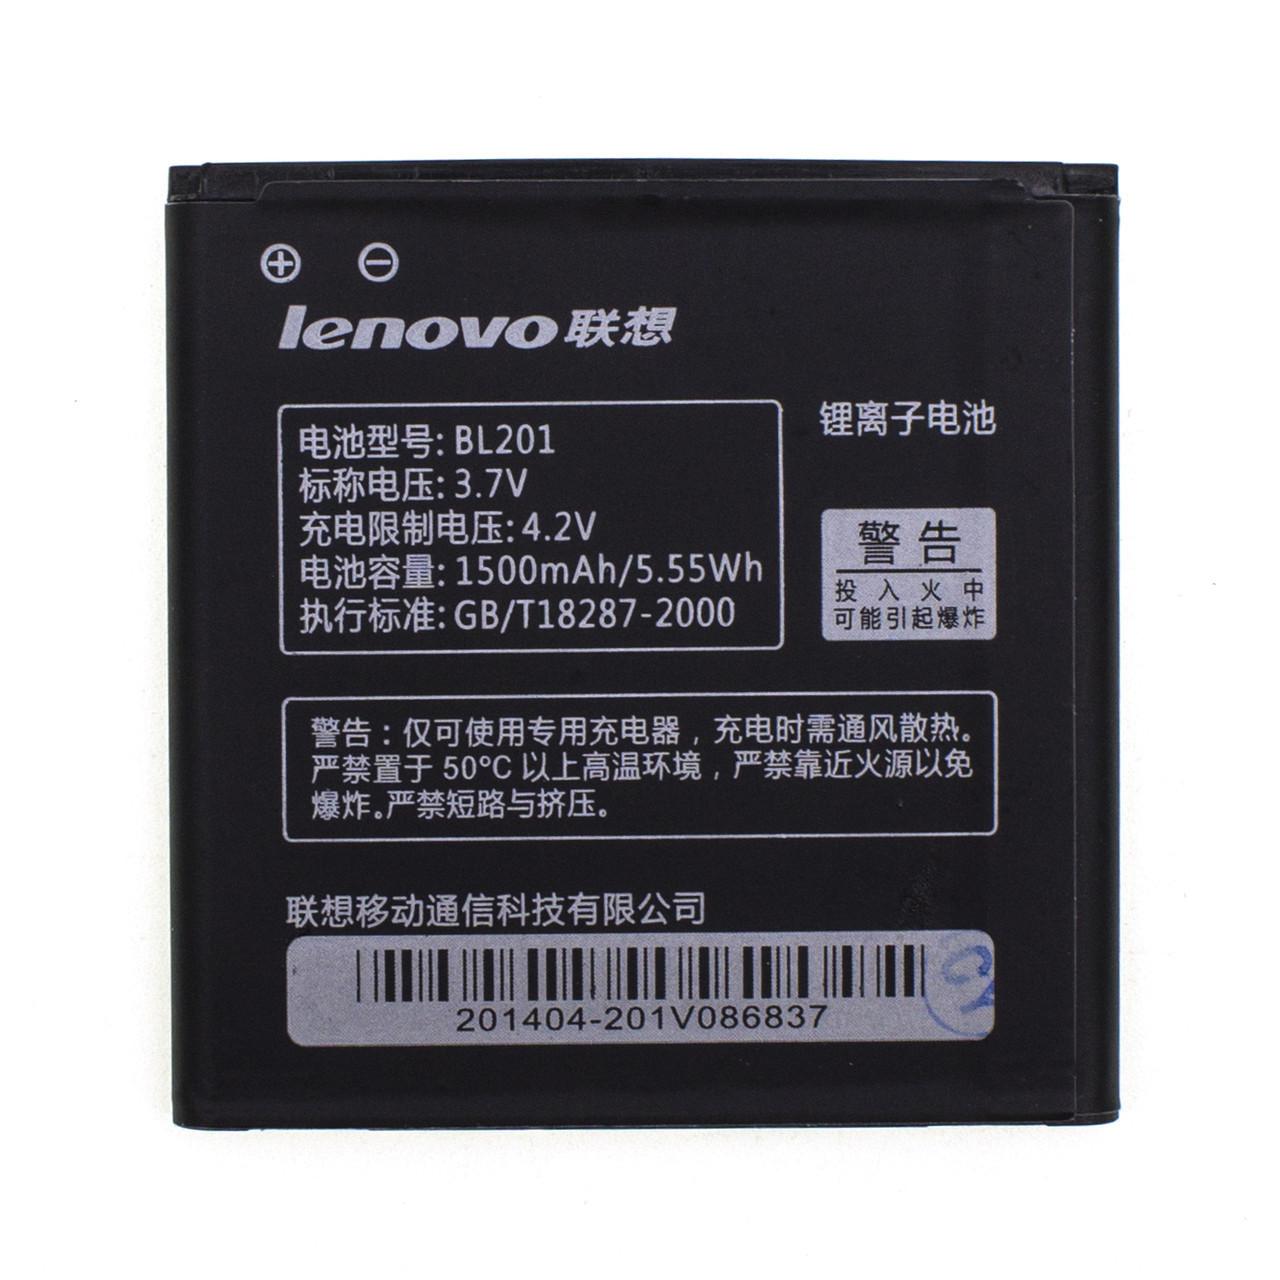 Аккумулятор Lenovo BL-201 1500 mAh к Lenovo A60